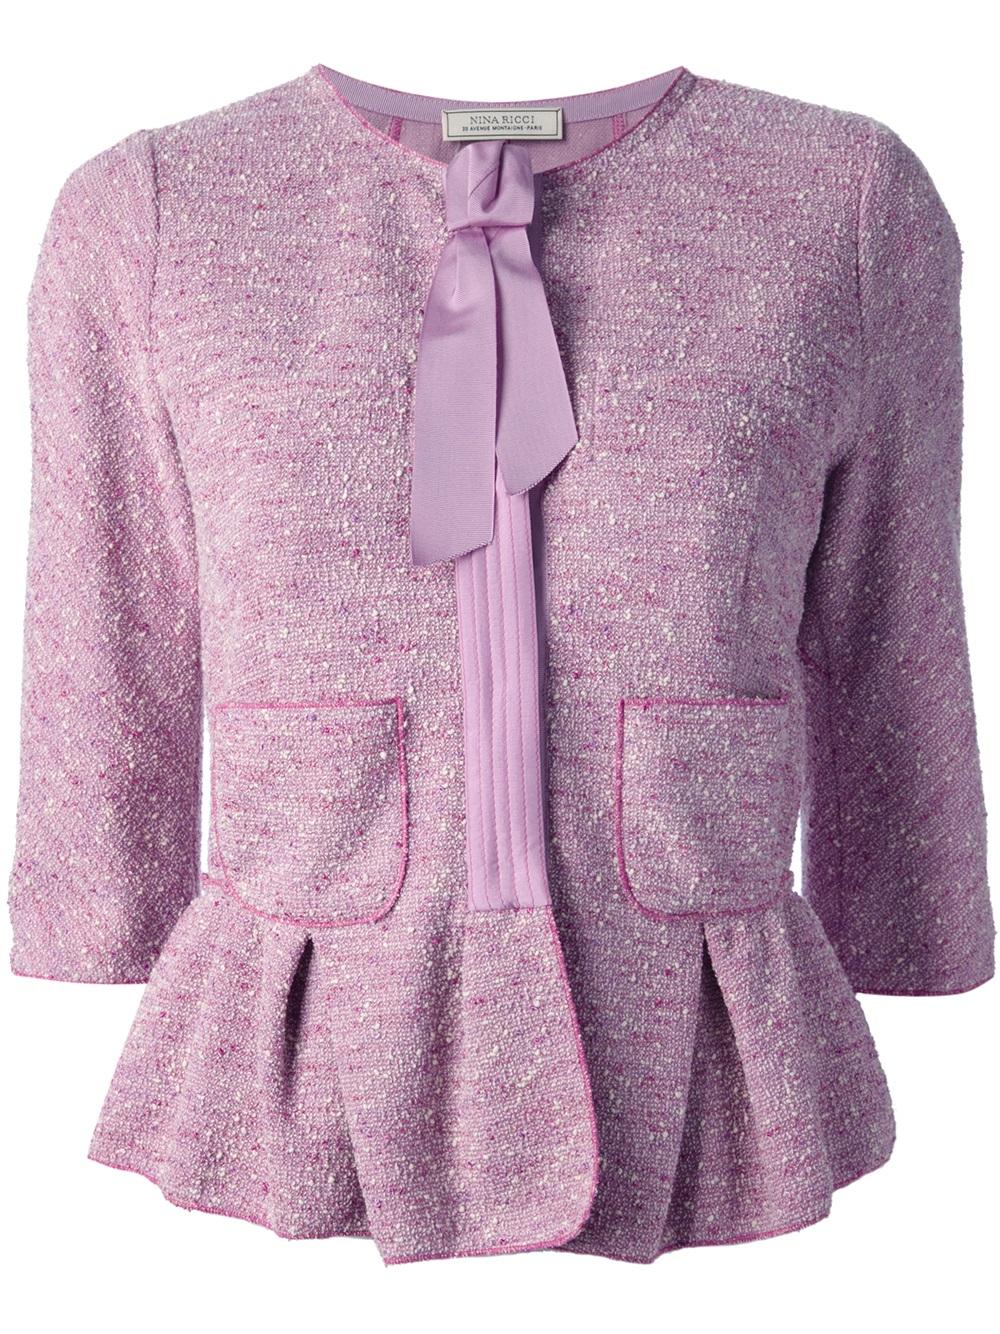 766c429abe09 Lyst - Nina Ricci Tweed Jacket in Purple